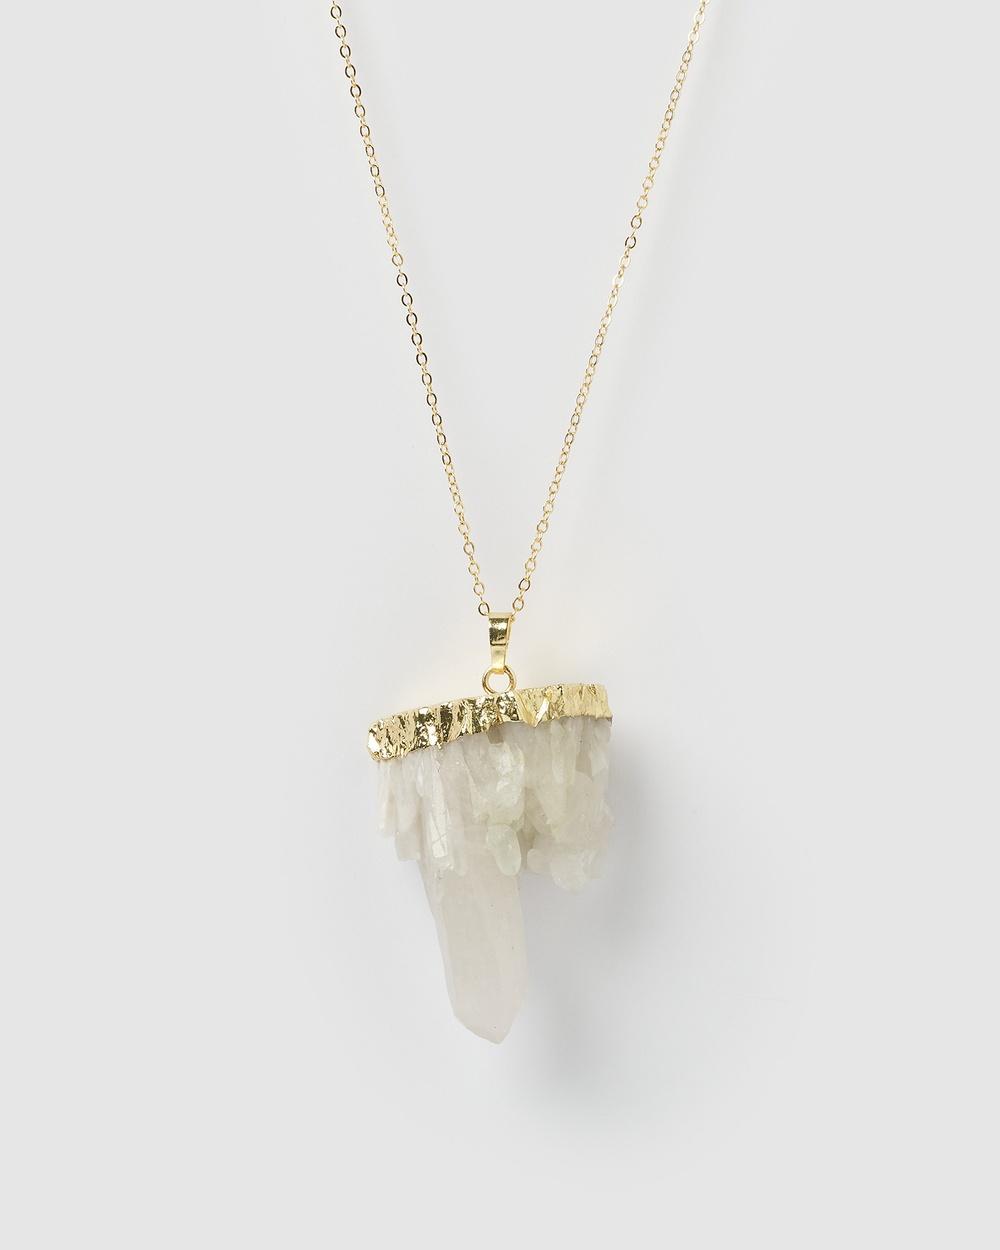 Miz Casa and Co Glacier Necklace Jewellery Clear Quartz